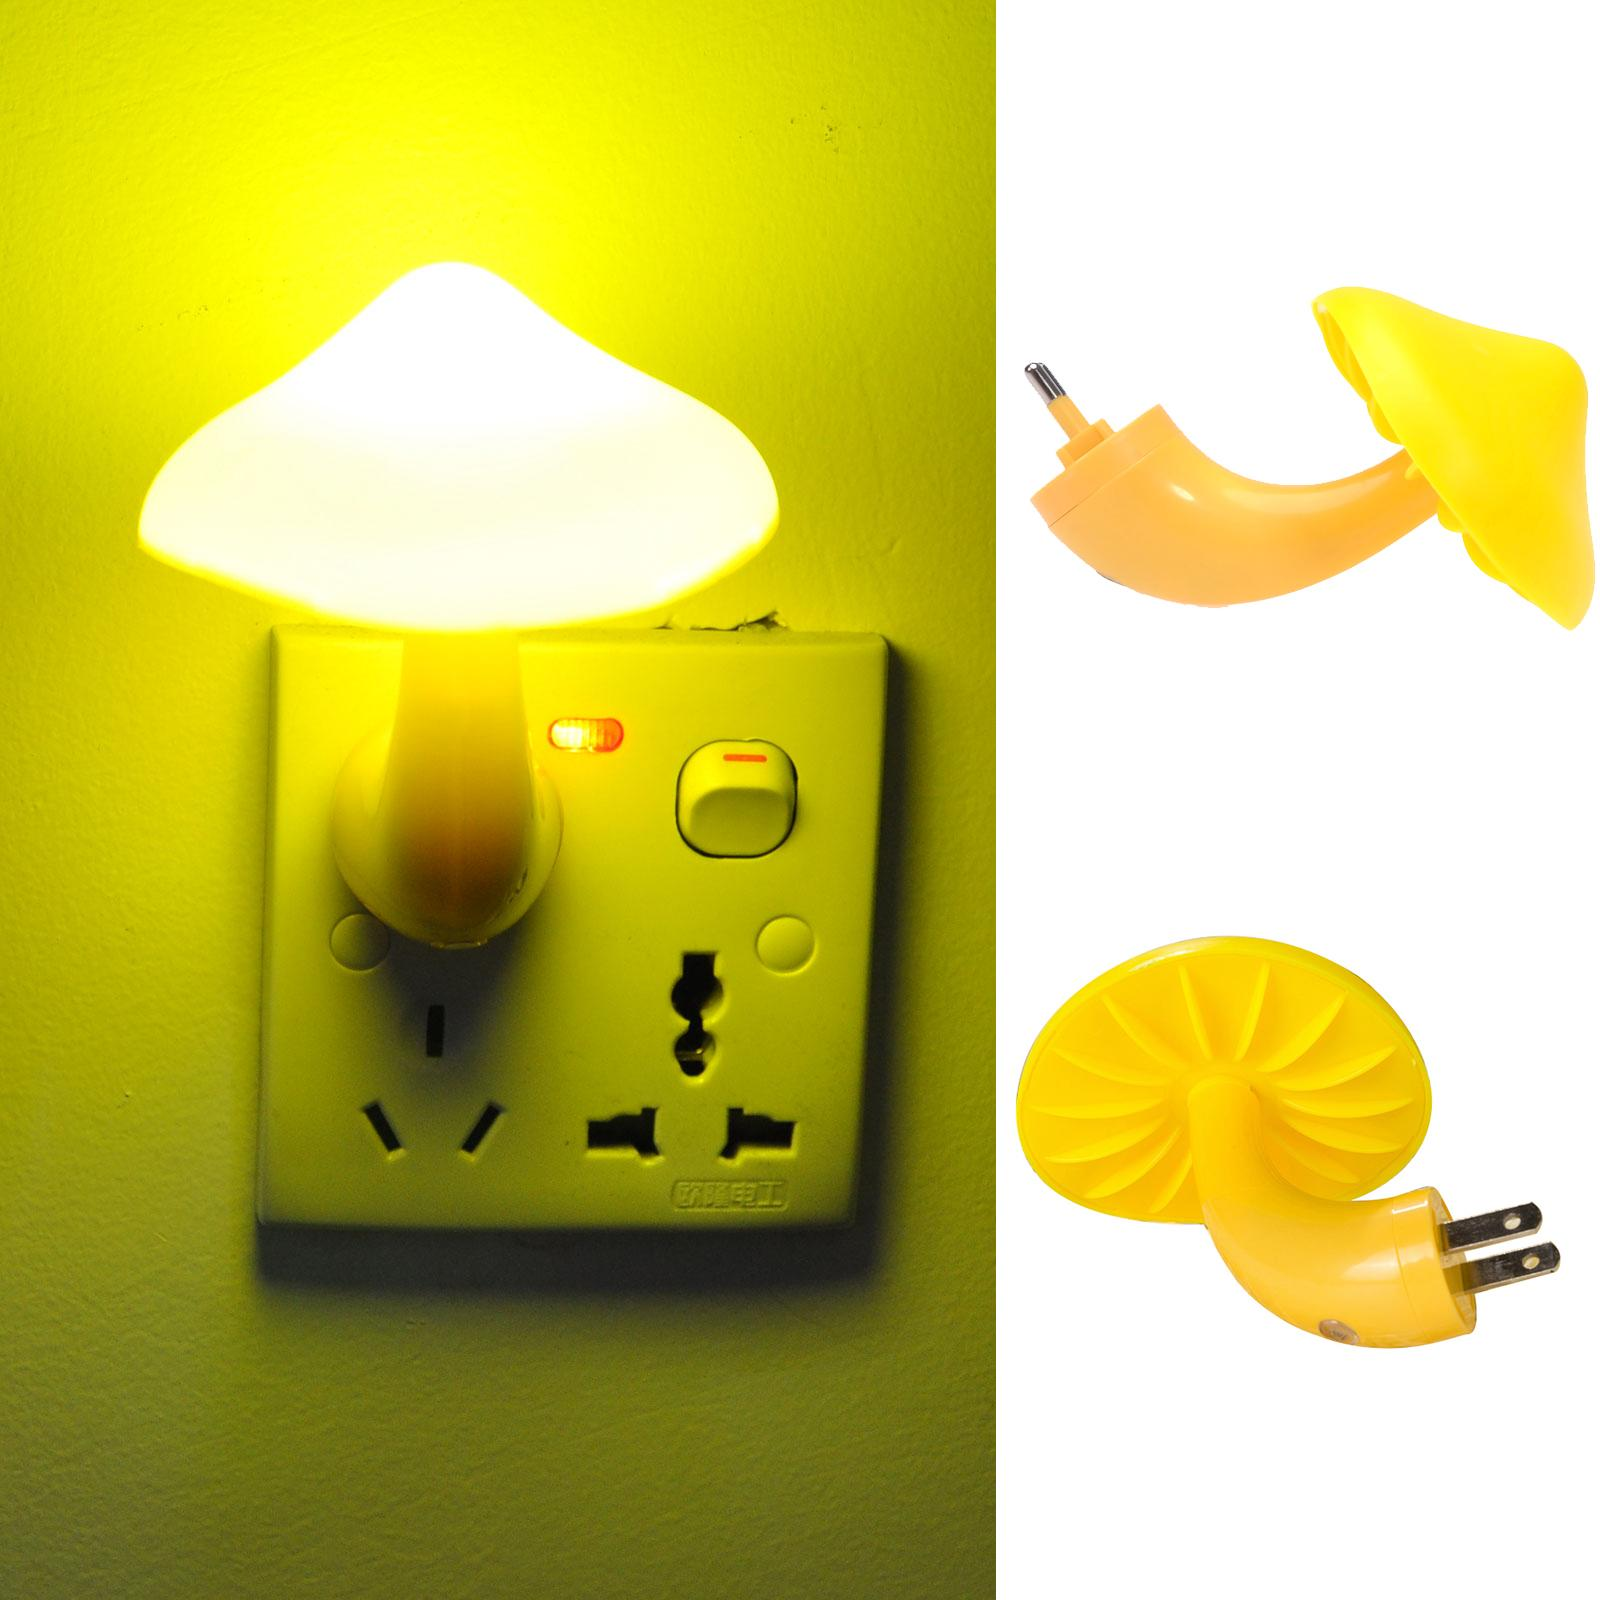 Led Lamps Lights & Lighting Us Plug Led Night Light Light Sensor Control Nightlight Bedroom Wall Lamp For Baby Kids Girls Bedside Sleep Lamps 220v Eu